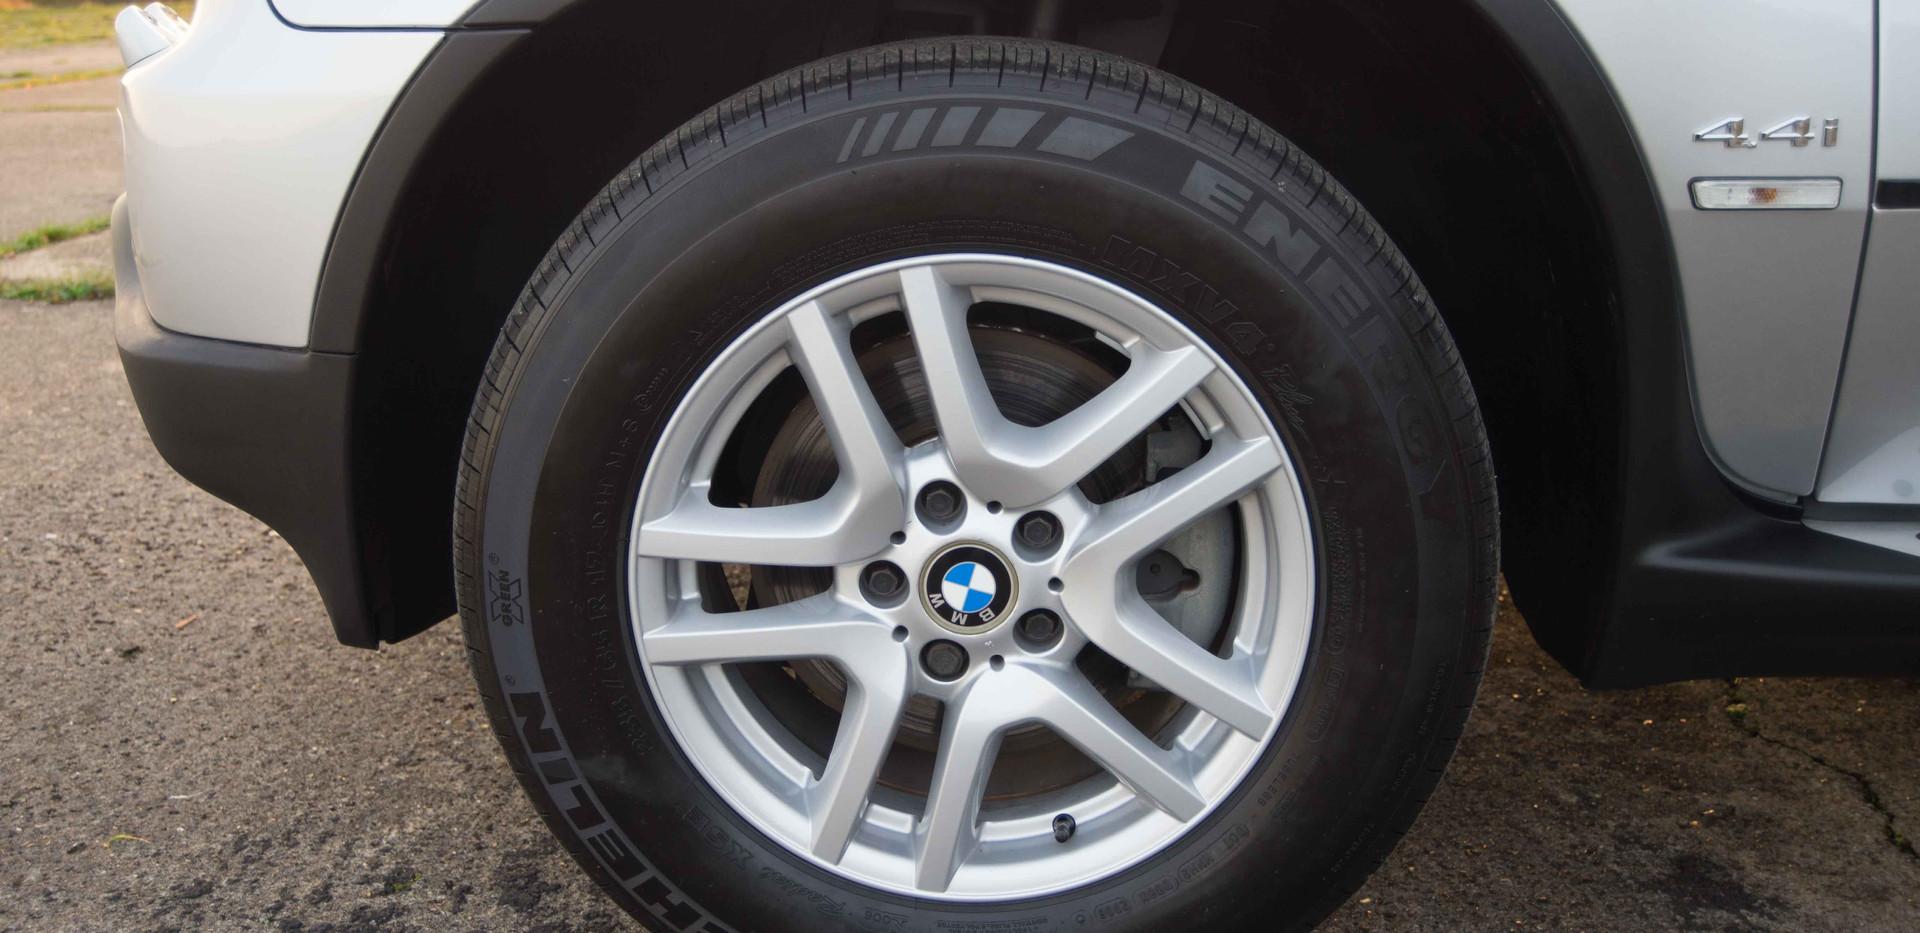 BMW E53 X5 4.4i For Sale UK London  (23